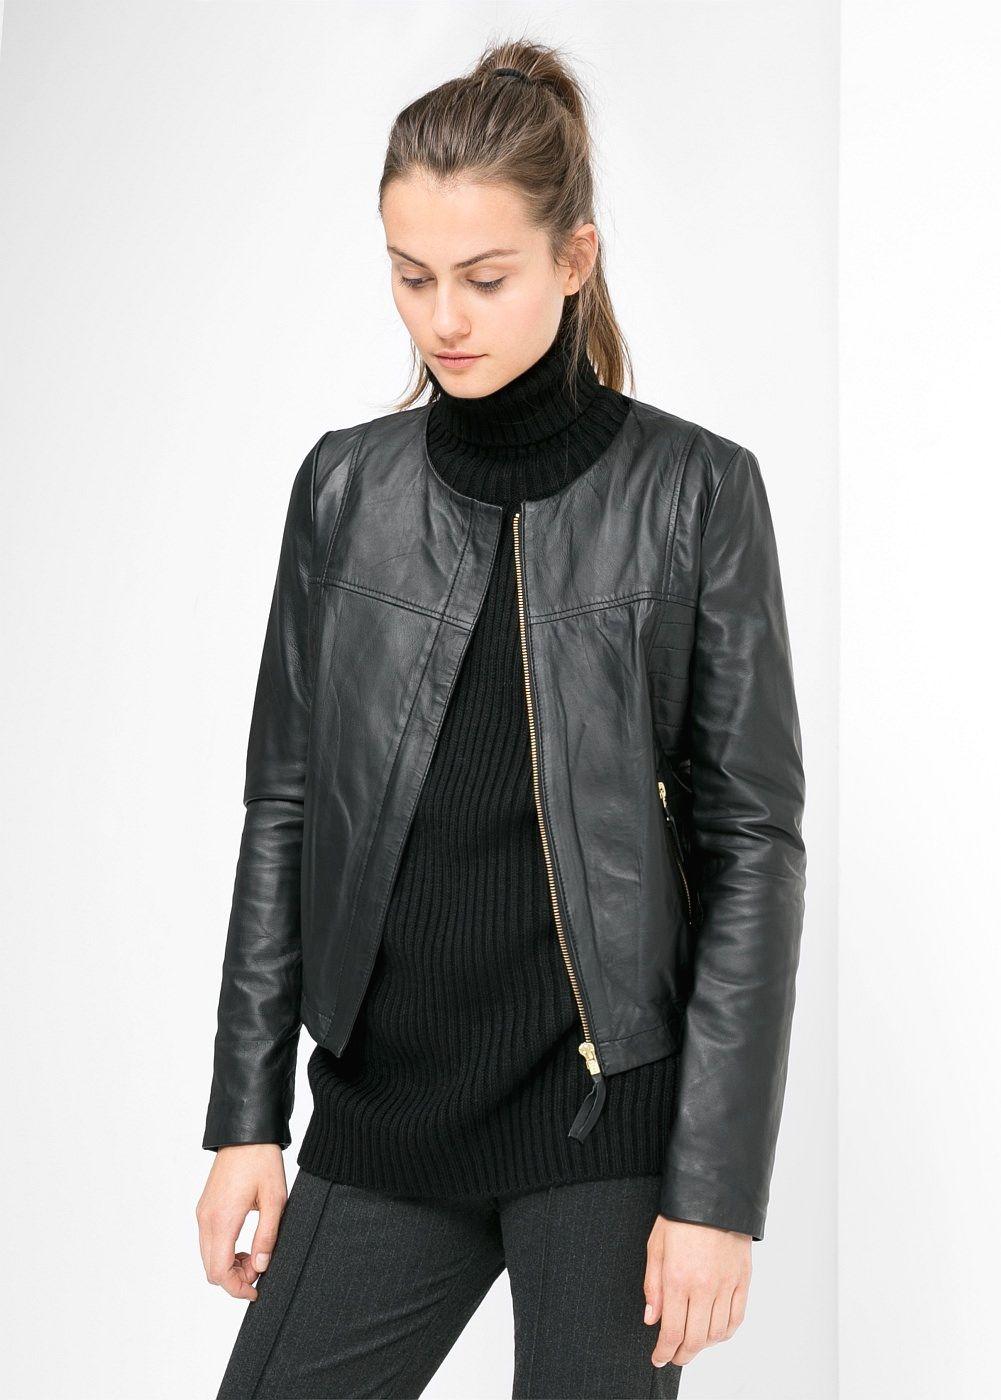 Leather Bomber Jacket Women Mango Usa Bomber Jacket Women Leather Bomber Jacket Women Leather Jackets Women [ 1400 x 1001 Pixel ]